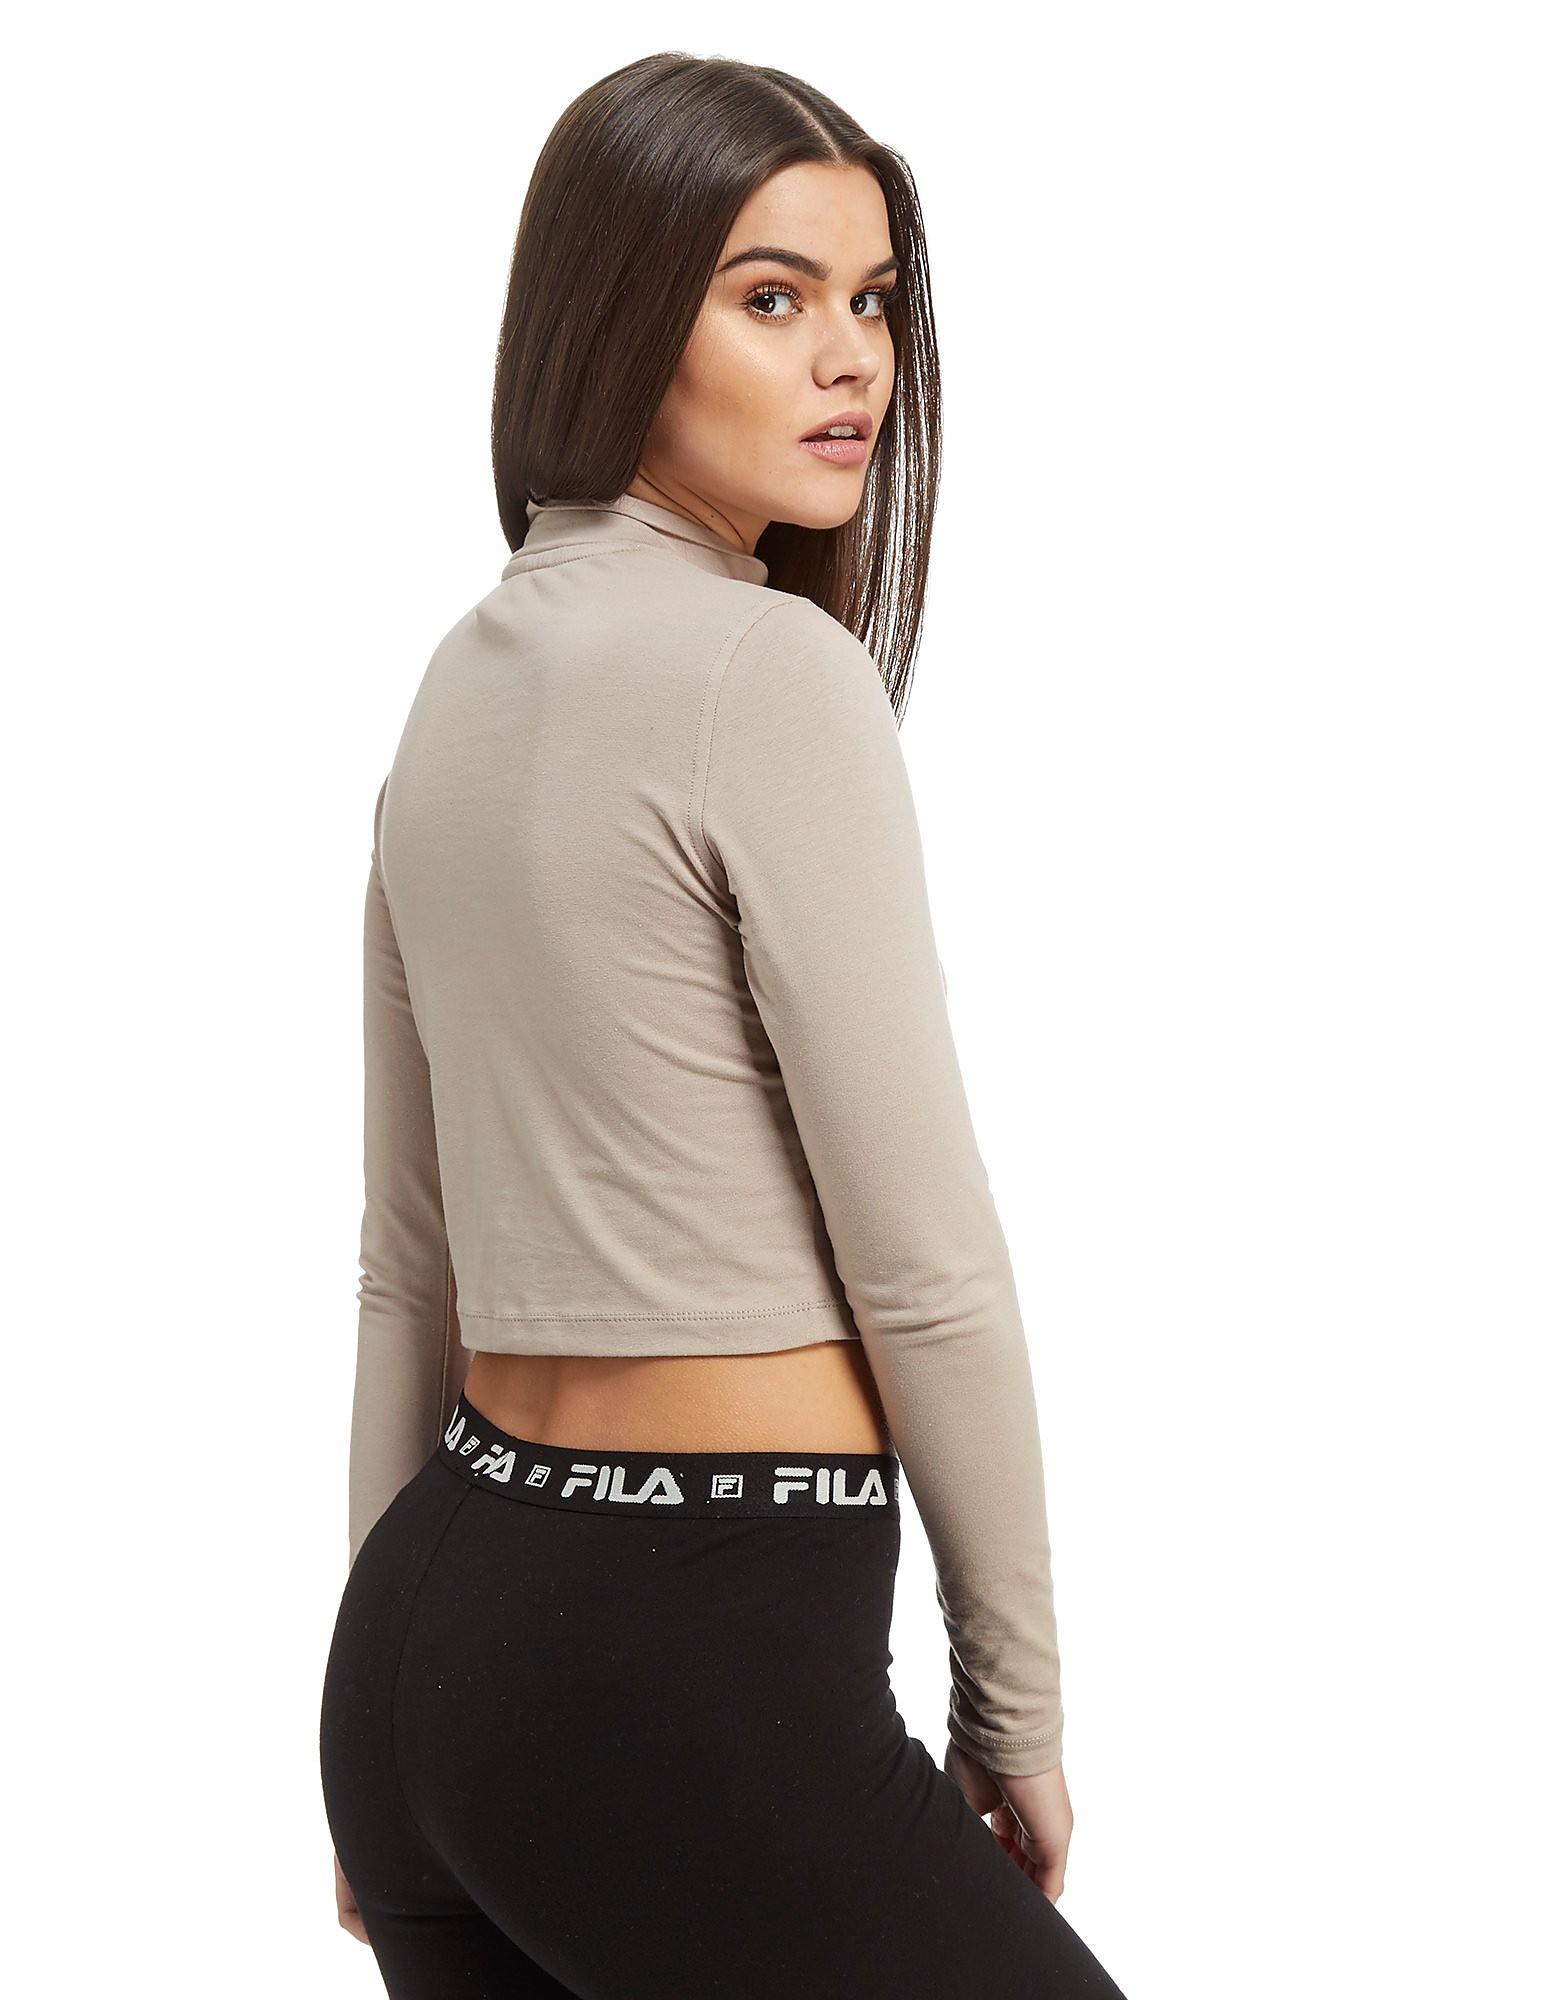 Fila Long Sleeve Cropped Top